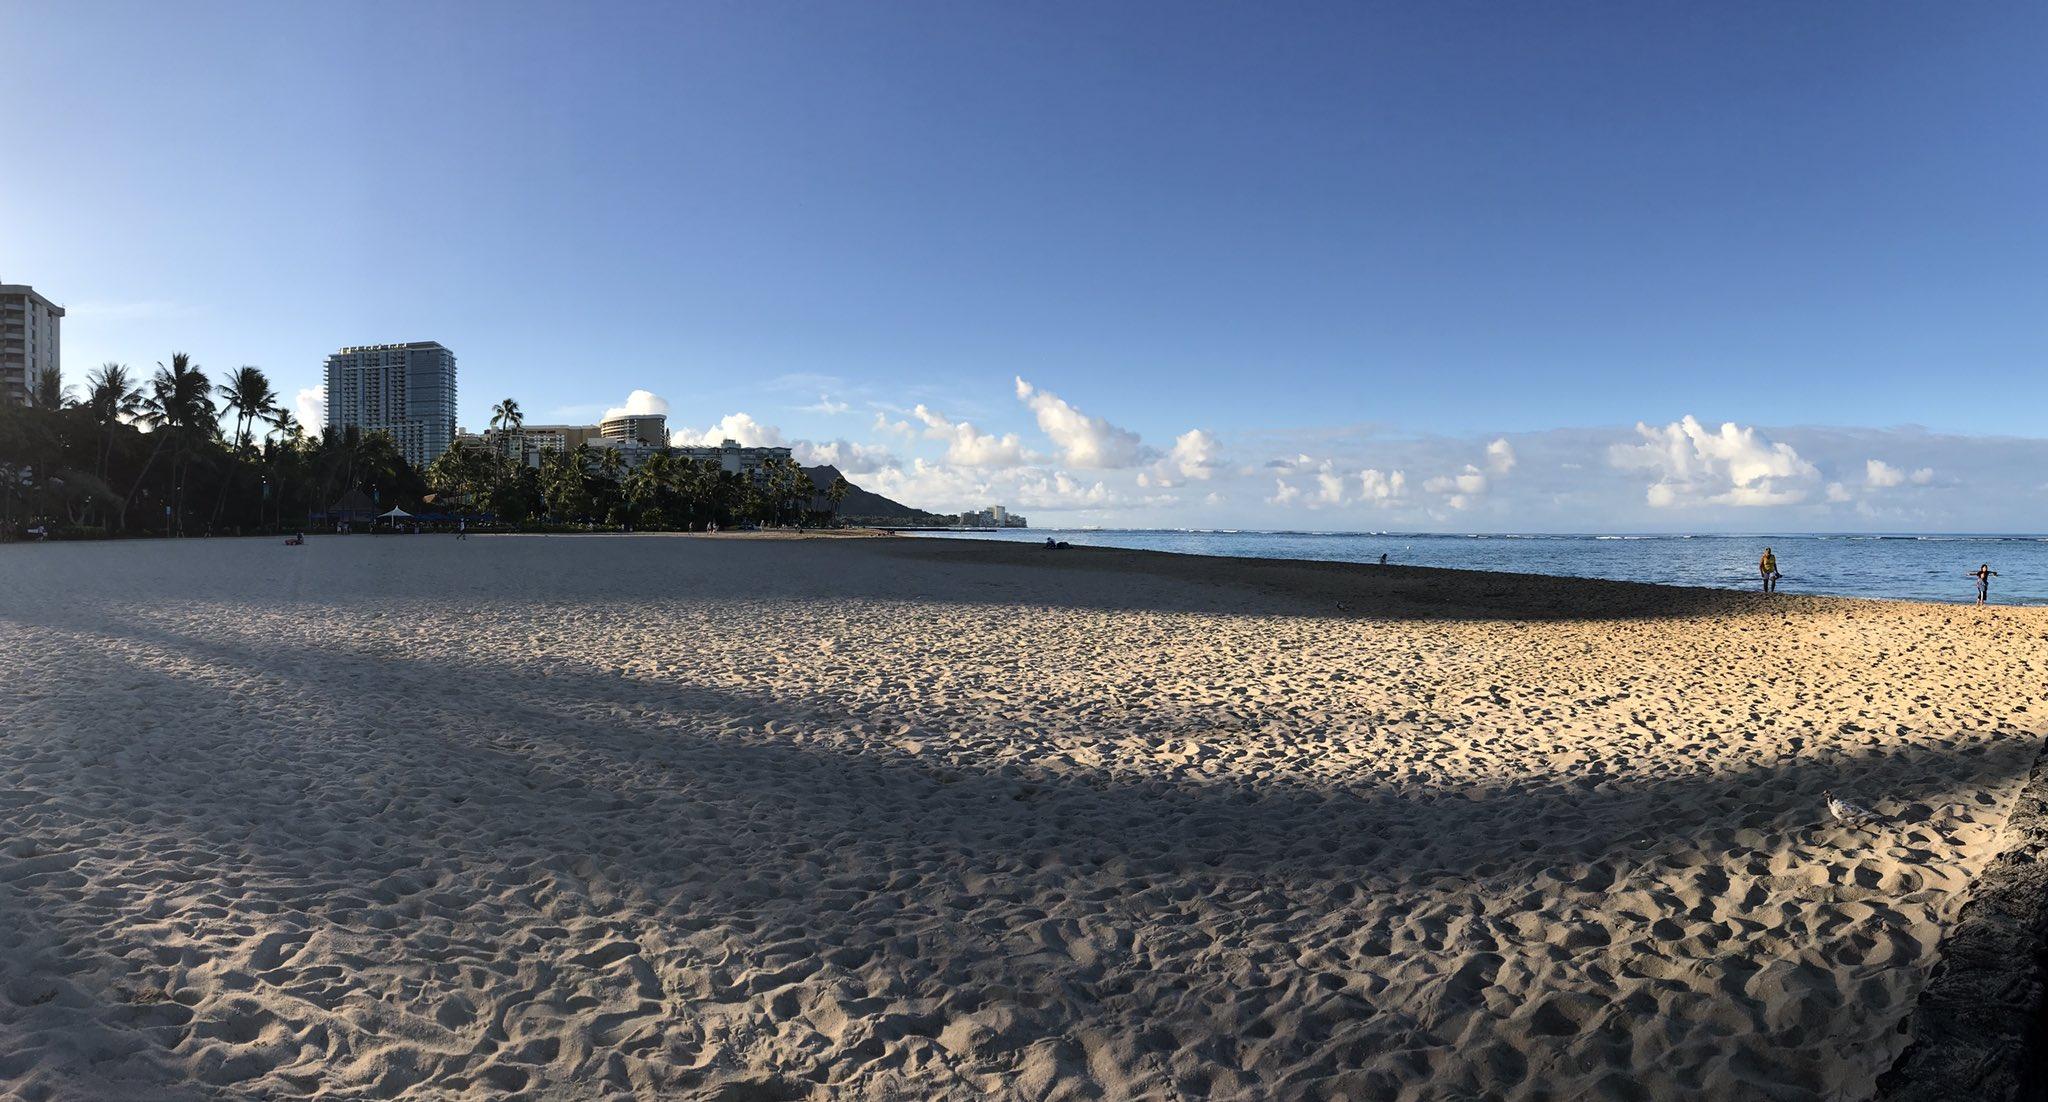 Good morning from Hawaii 🌴🌴🌴😁😁😁☀️☀️☀️ #plantbio17. @ASPB https://t.co/PV53nMERDw